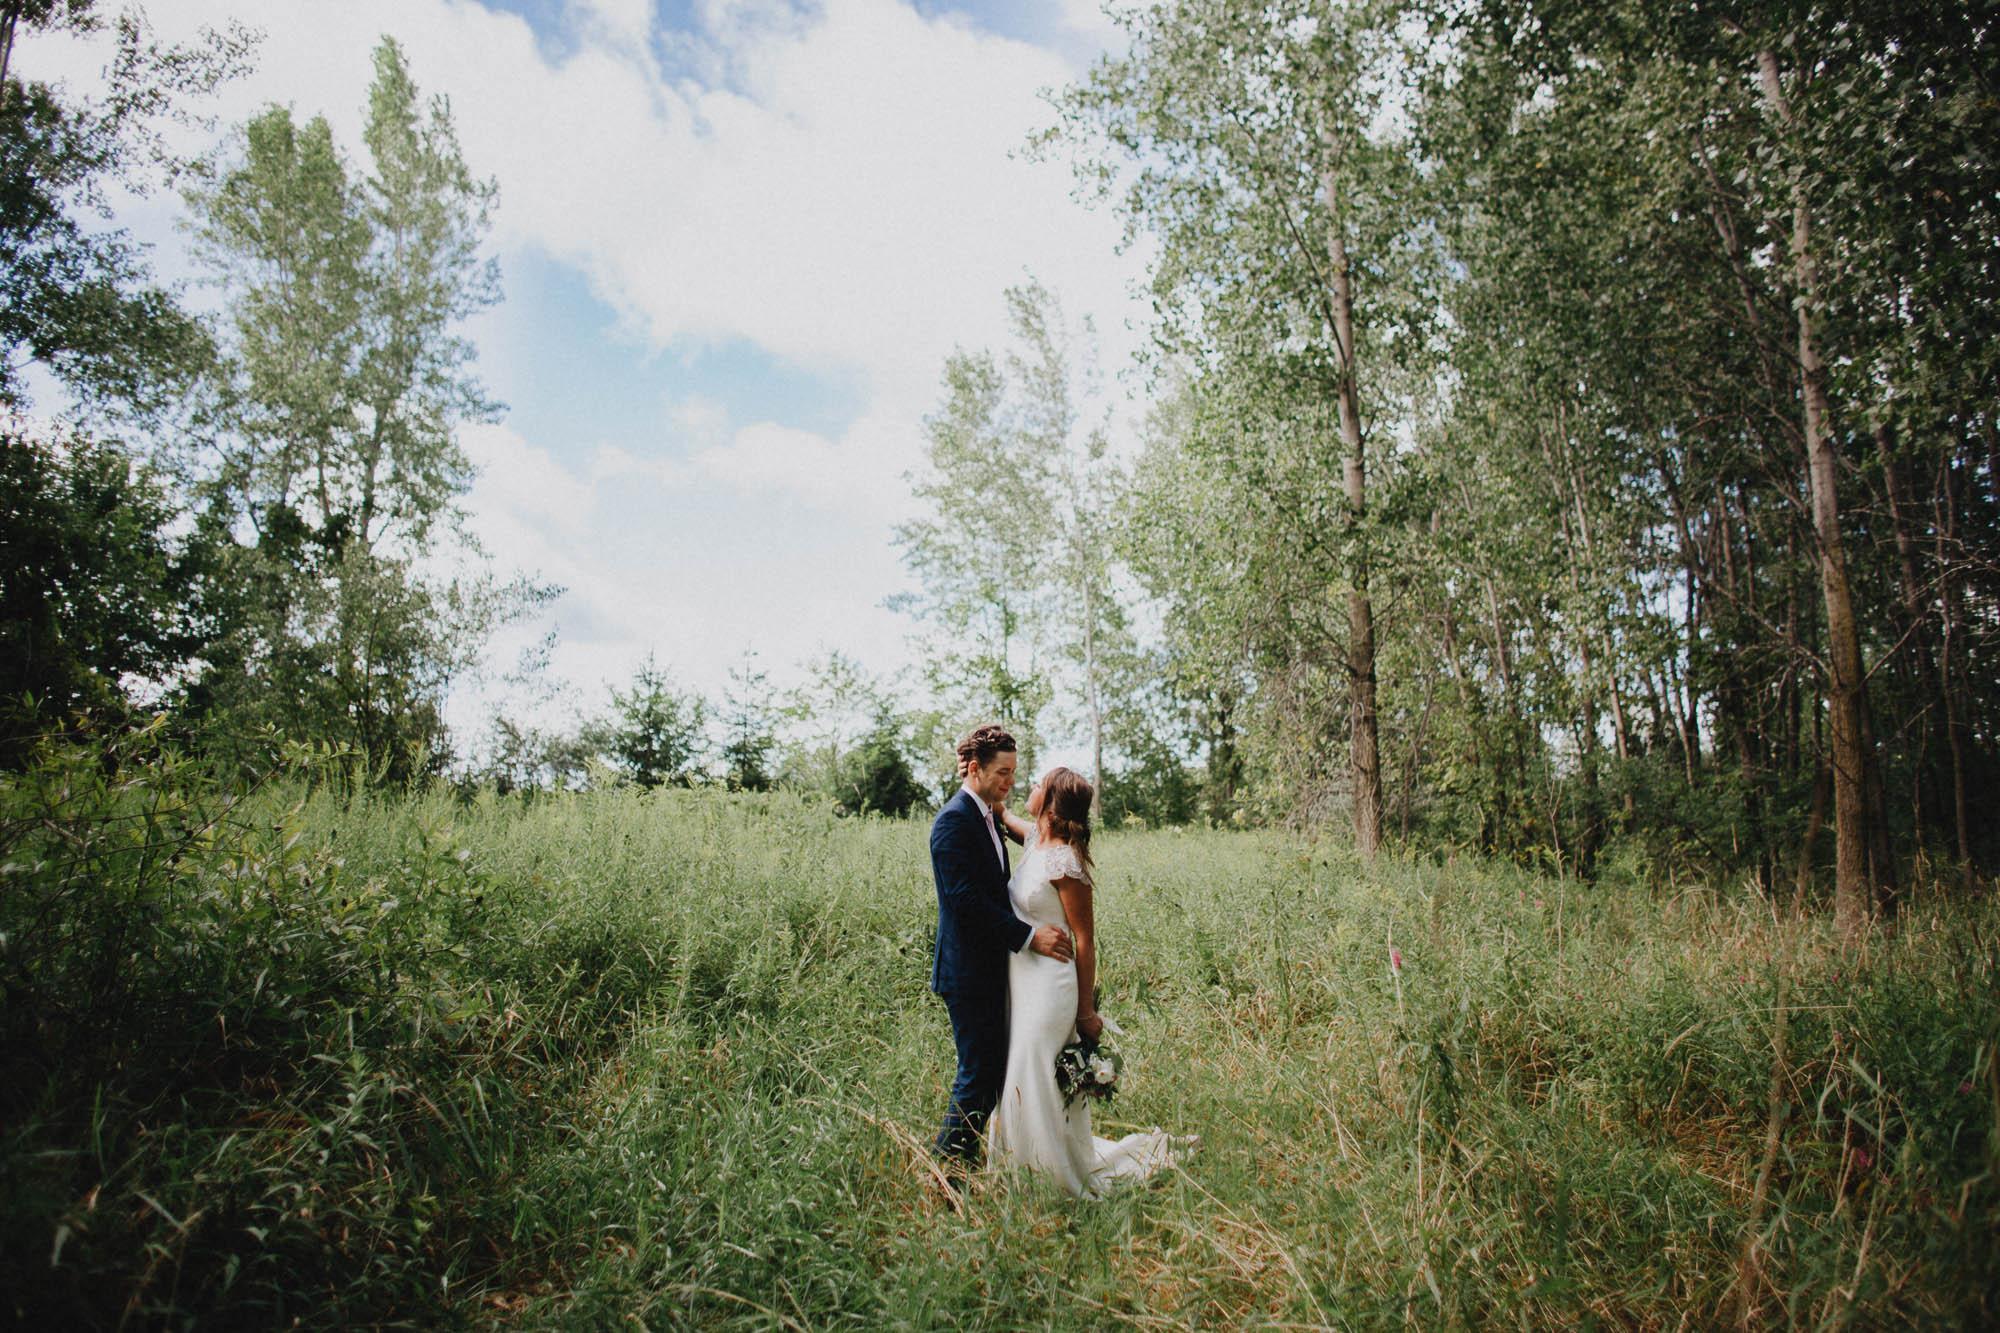 Leah-Graham-Michigan-Outdoor-DIY-Wedding-086@2x.jpg